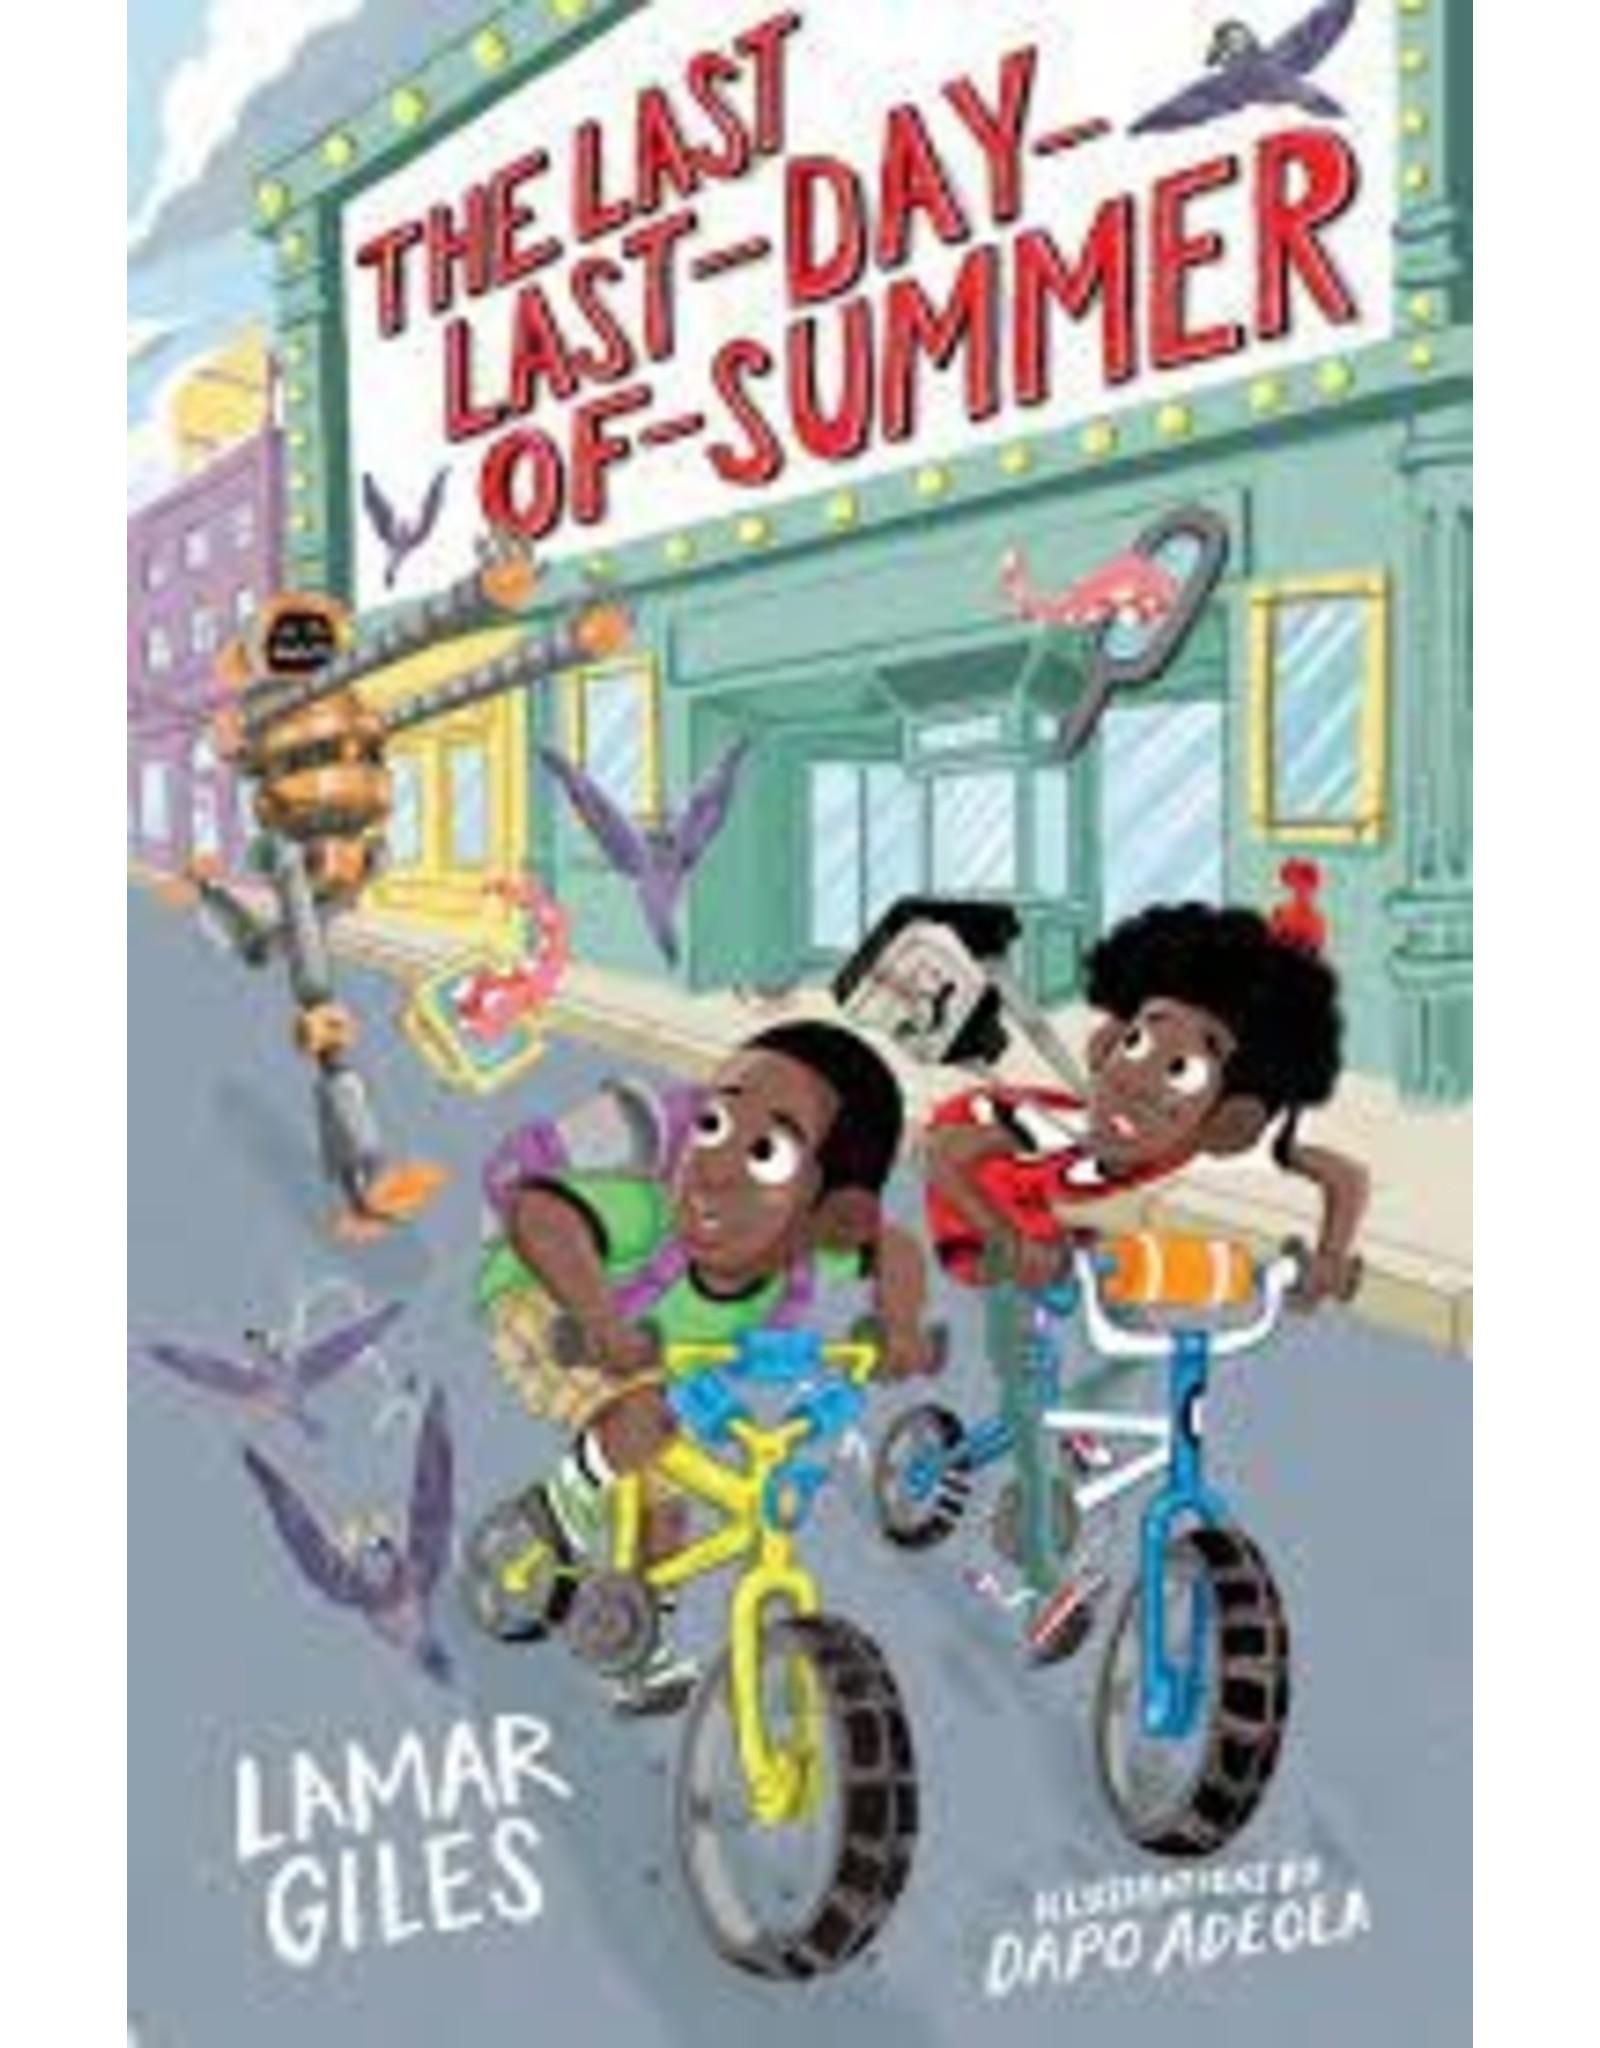 Books Last Last-Day-of- Summer by Lamar Giles (summerbookclub)